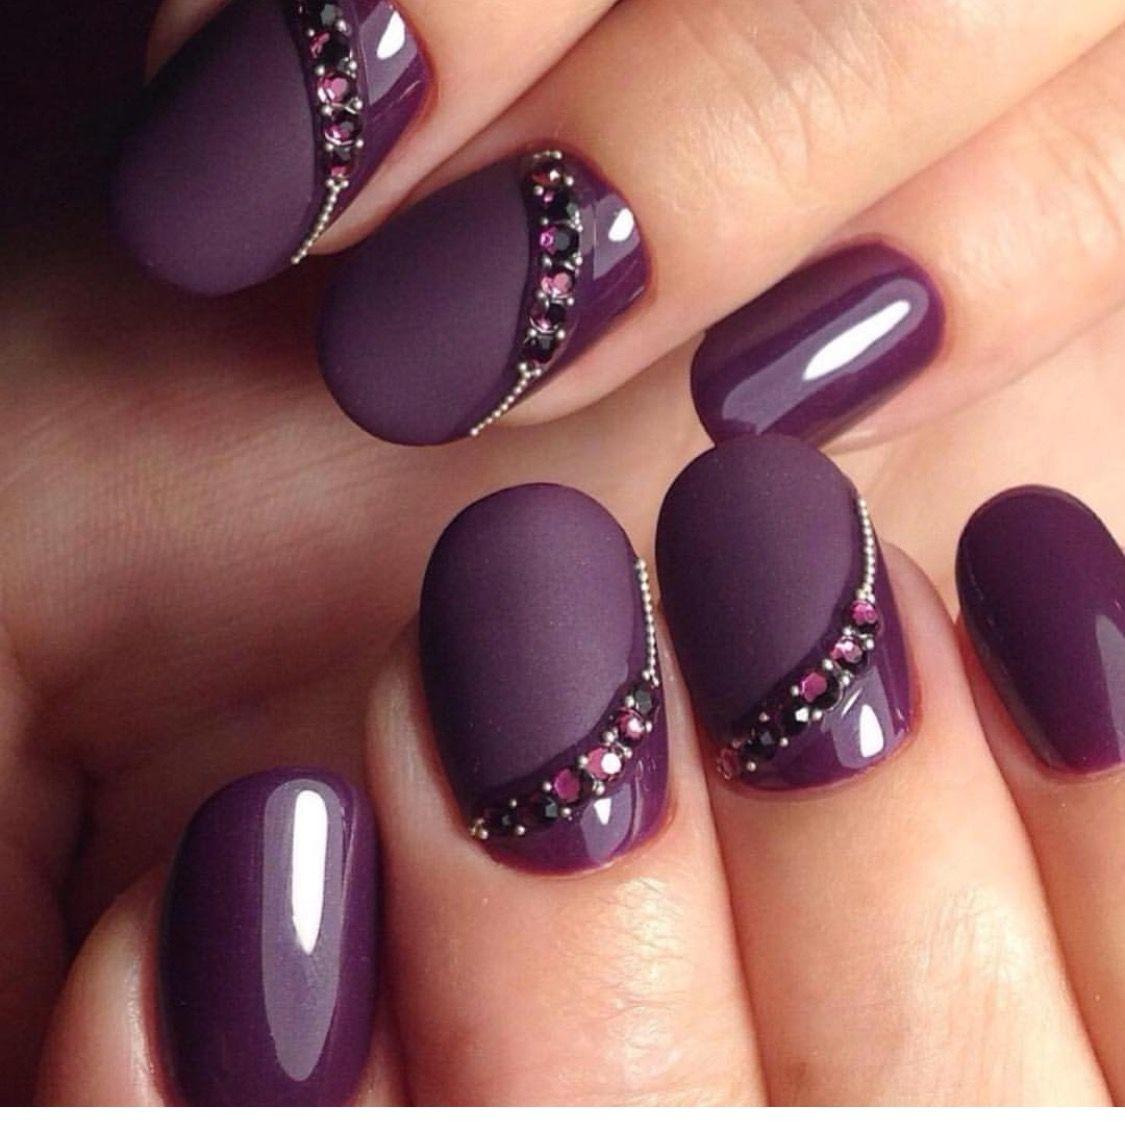 Elegantly Done Nails Love The Subtle Sophistication Fialove Nehty Barva Nehtu Nehty Na Nohou